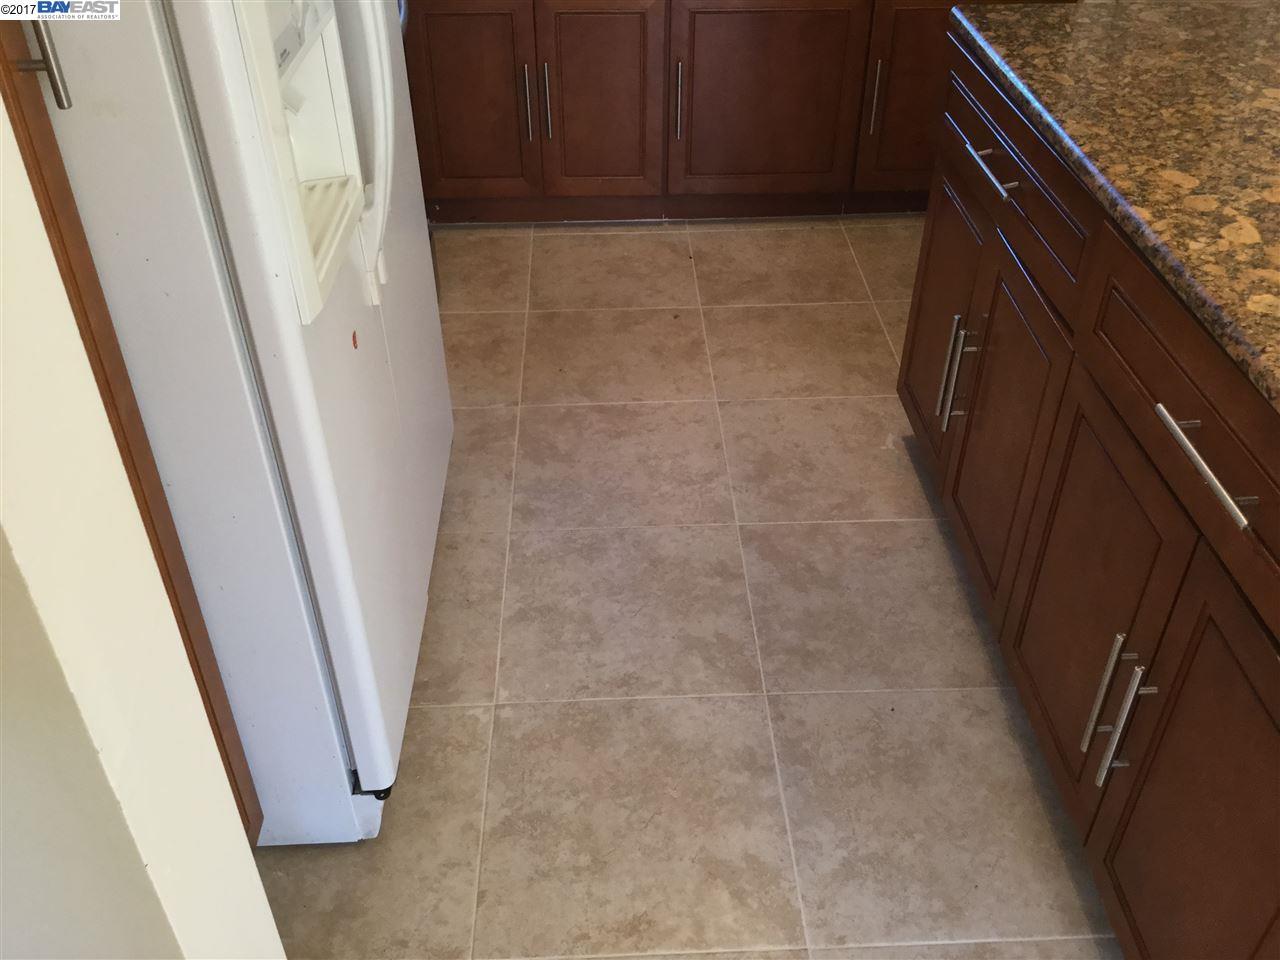 Additional photo for property listing at 1435 172Nd Avenue 1435 172Nd Avenue Hayward, California 94541 Estados Unidos